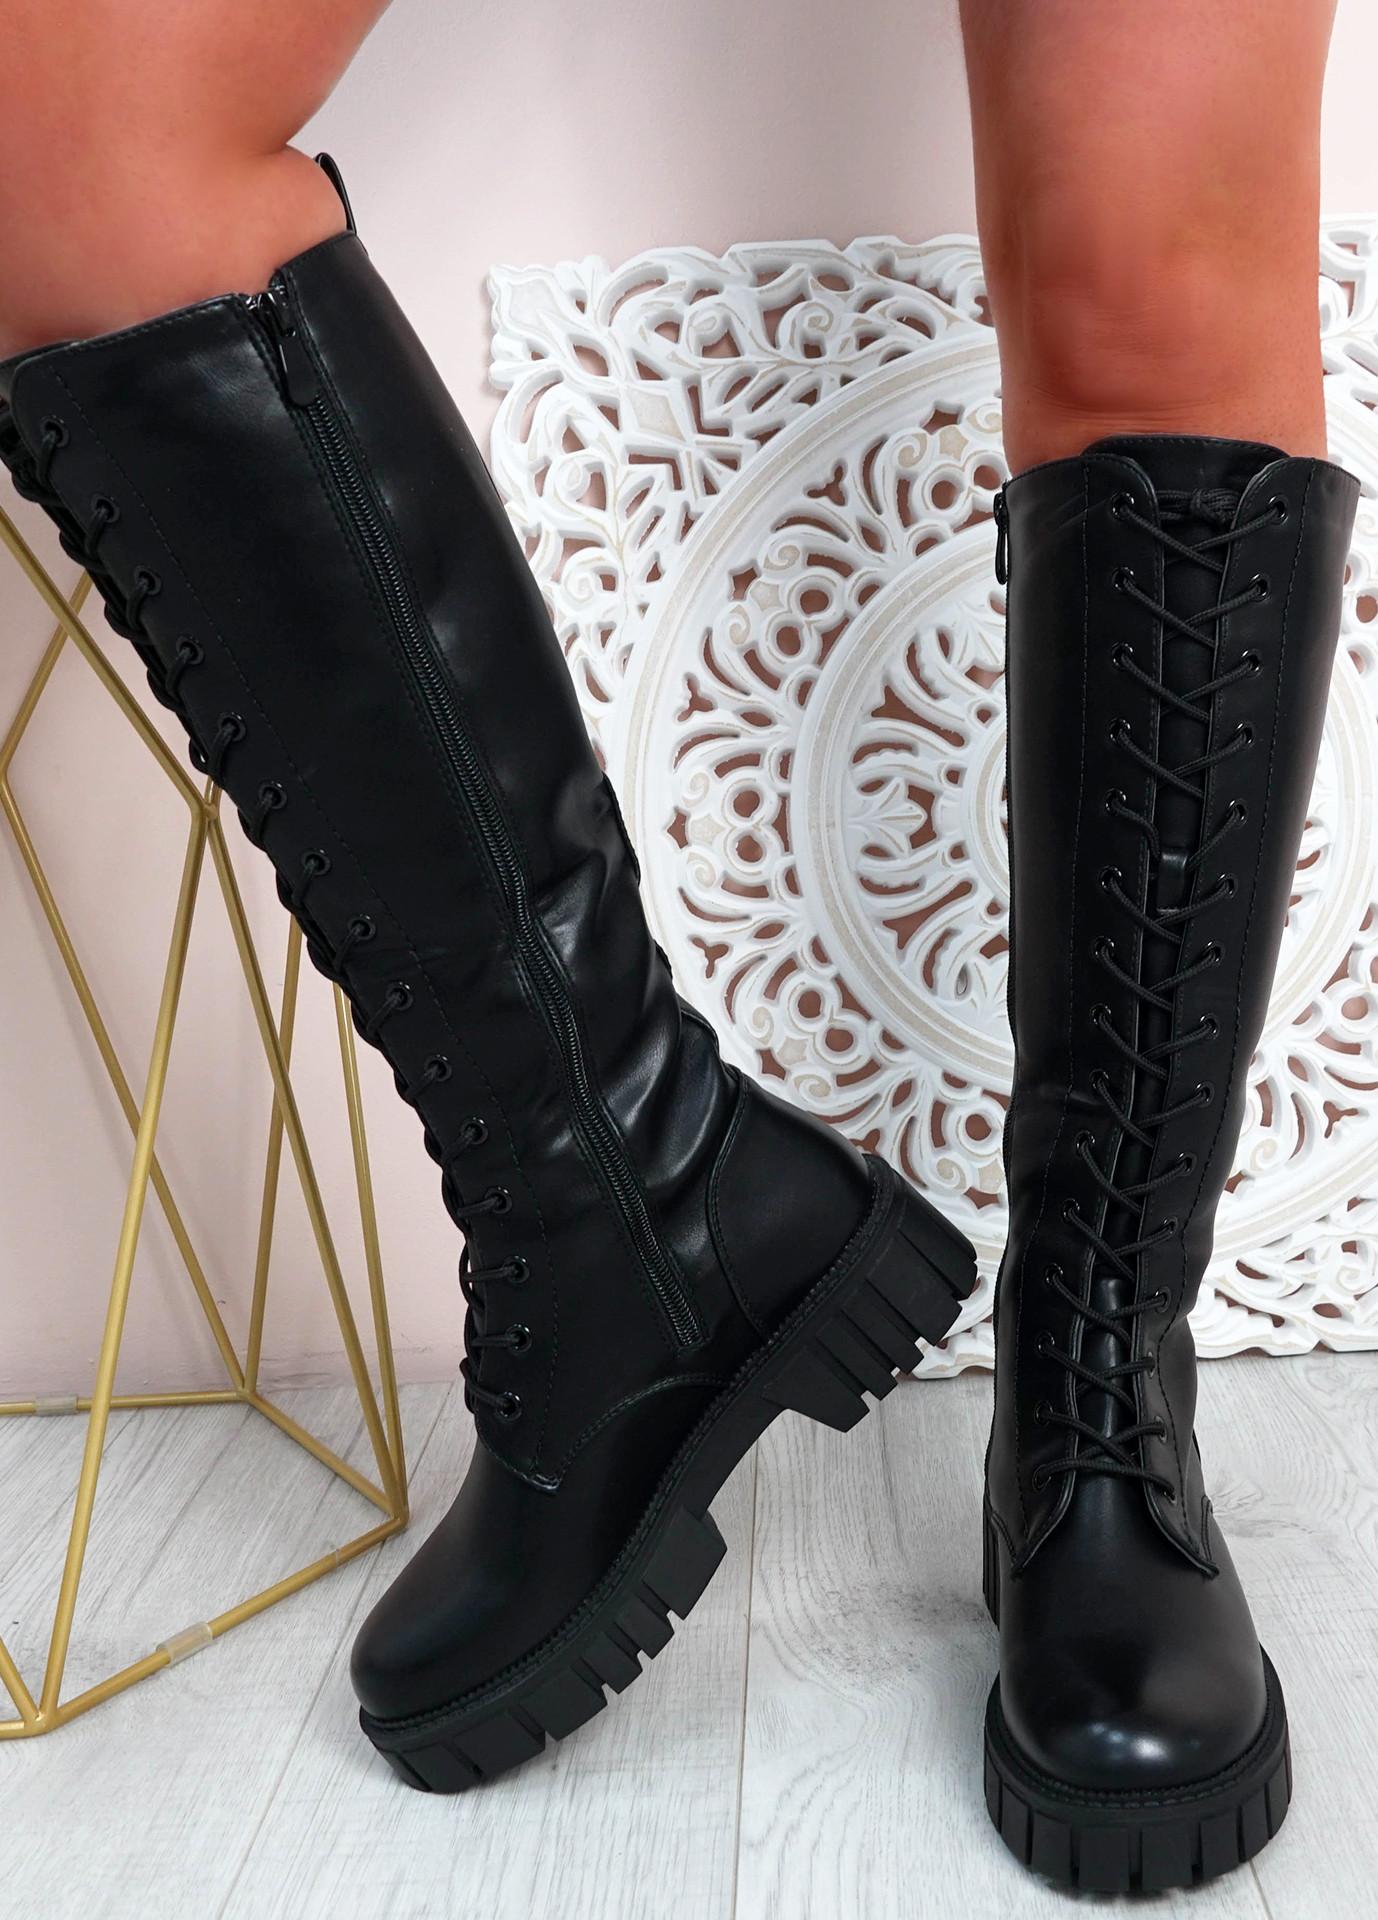 Priscilla Black Knee High Biker Boots